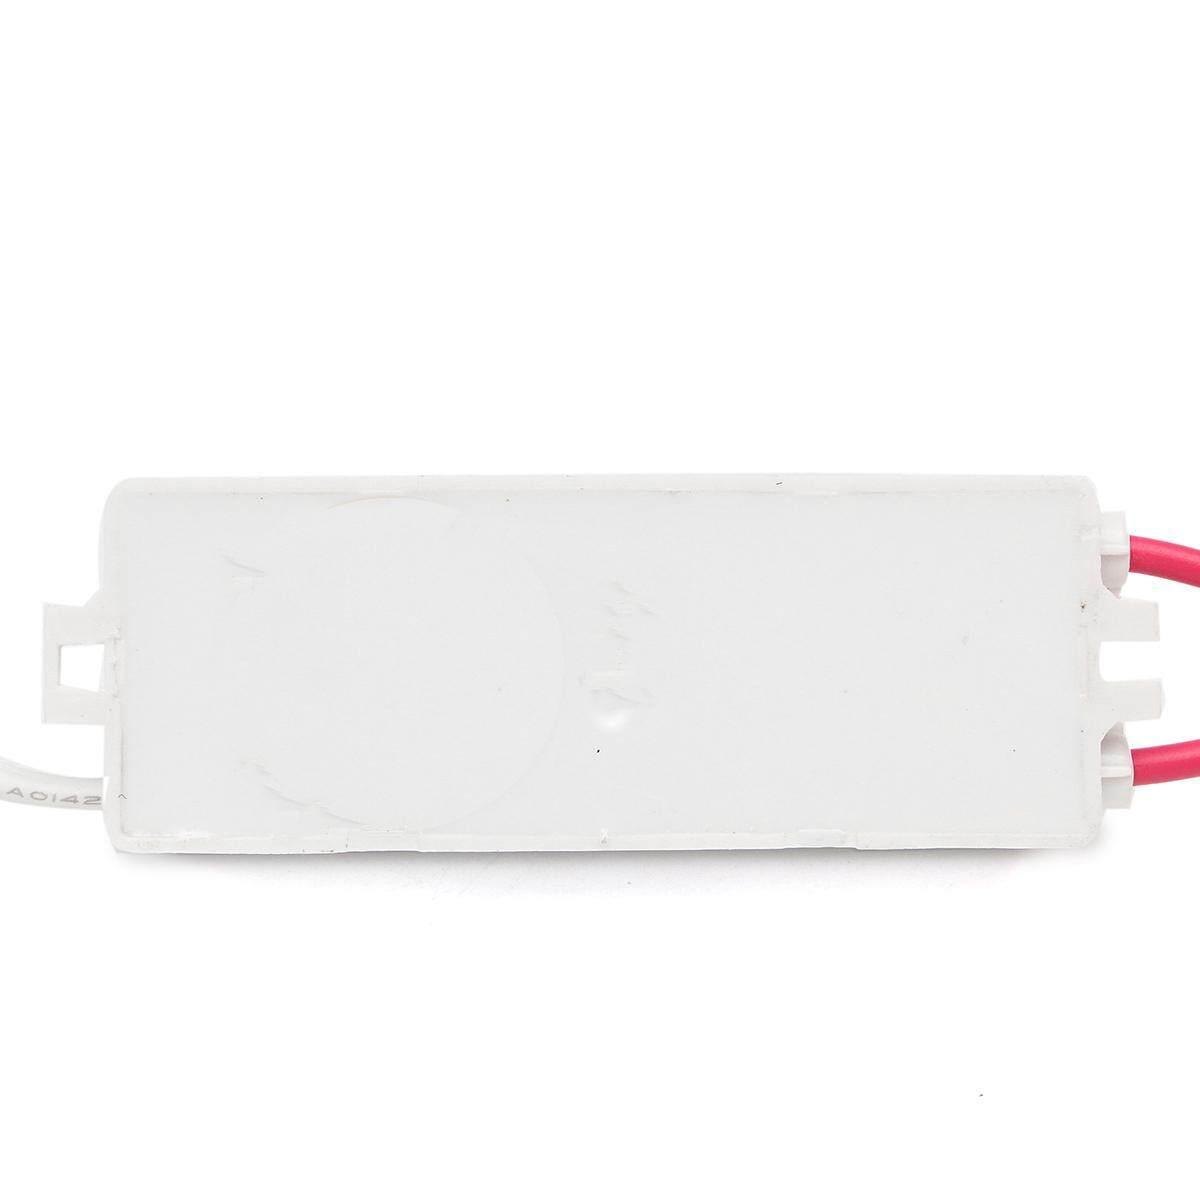 HB-C02 Plastic Neon Light Electronic Transformer 3KV 30mA Load Neon Sign Power Supply - intl - 3